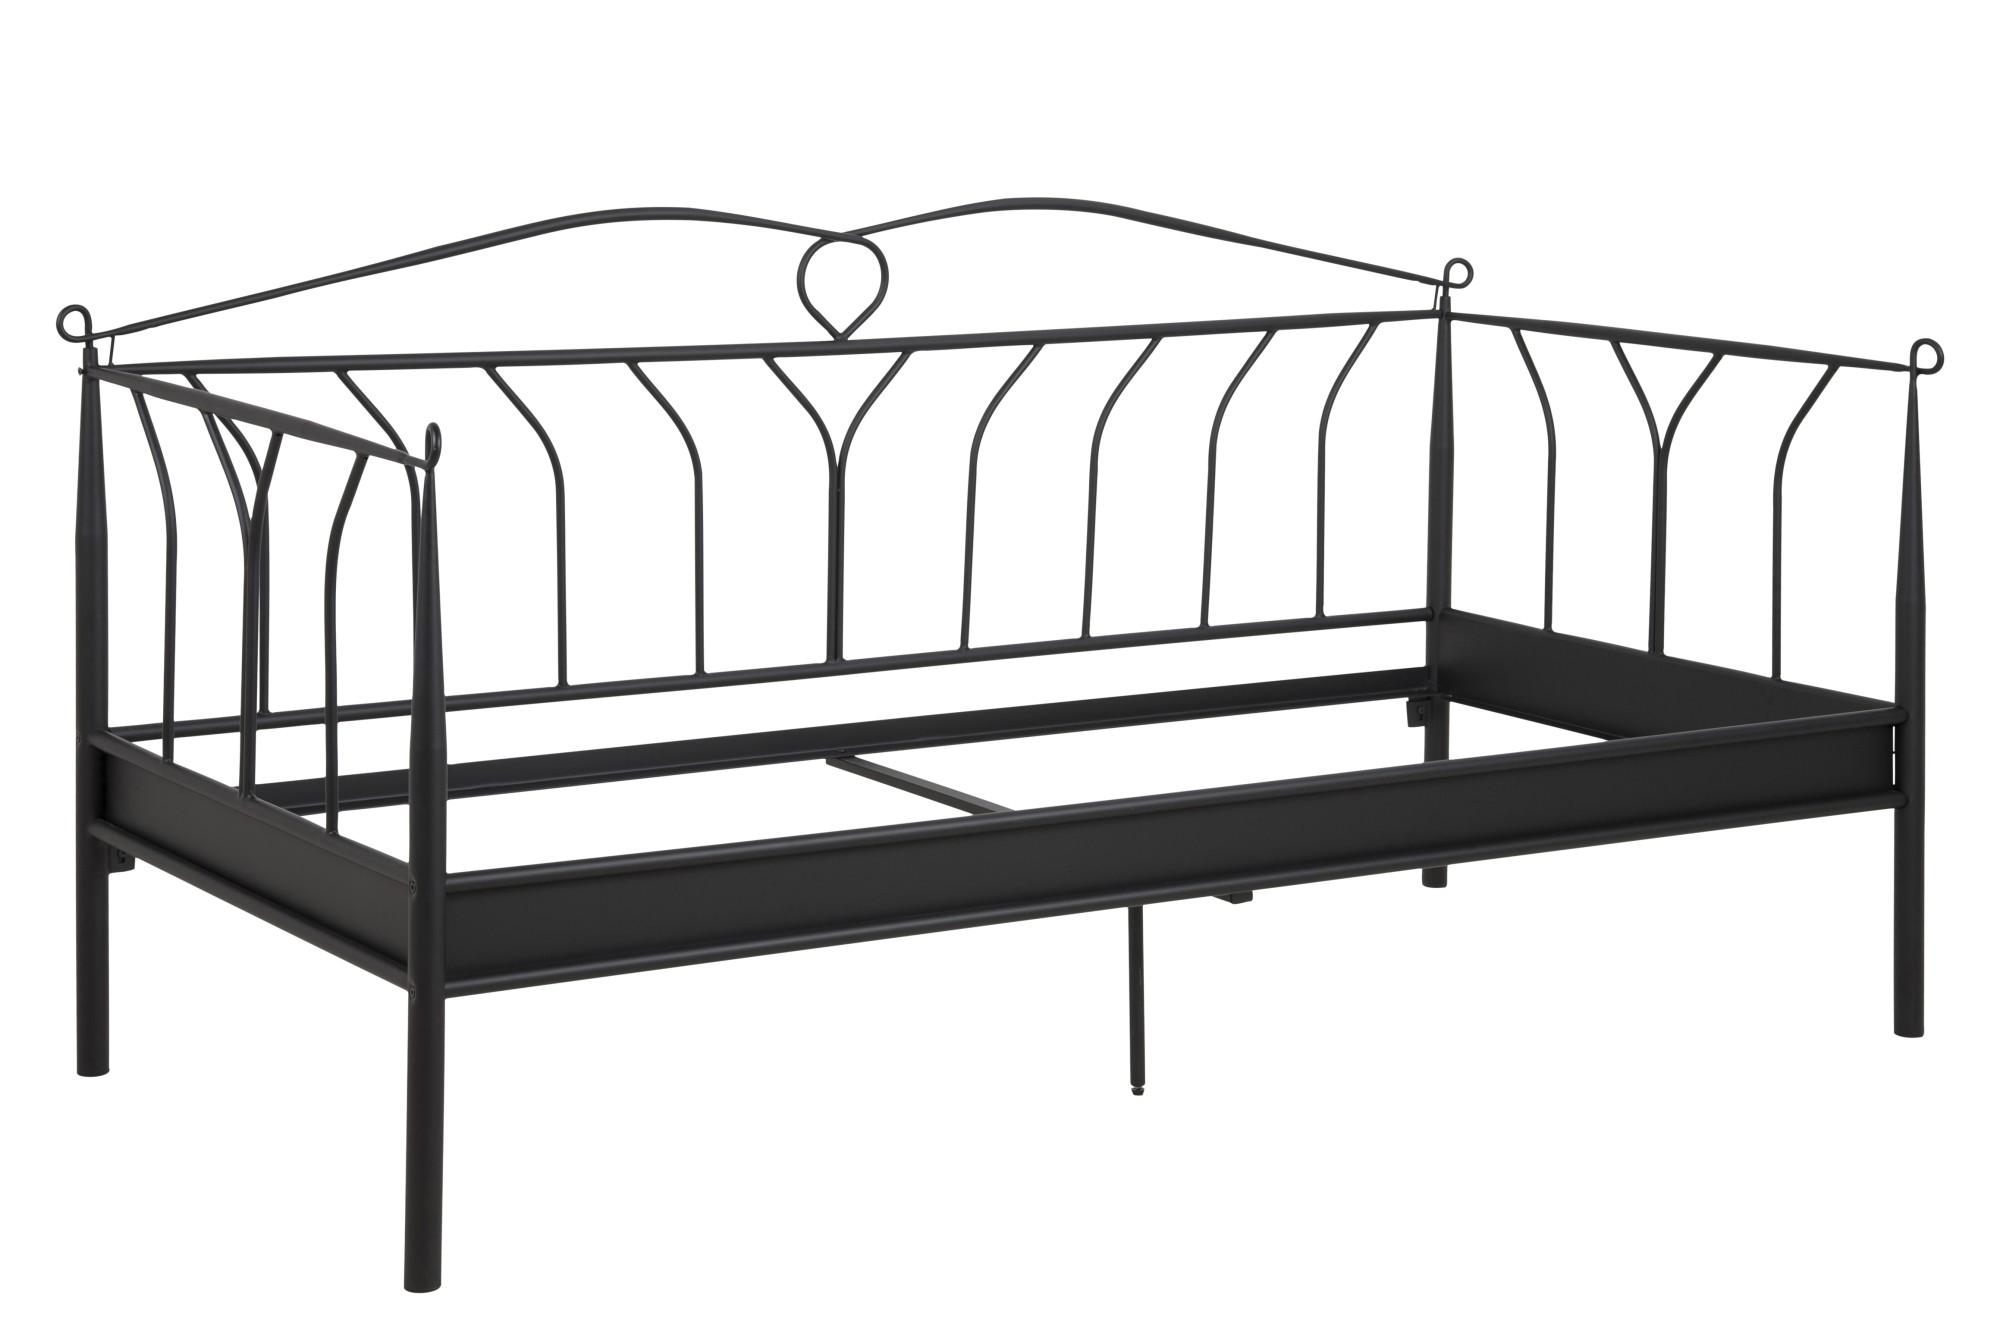 Full Size of Metall Bett Lissy 200x90 Schwarz Bettgestell Ehebett Schlafzimmer Cars 90x200 Mit Lattenrost Stabiles Jugendzimmer Regale 2x2m Landhaus 160x200 Und Matratze Bett Bett Metall